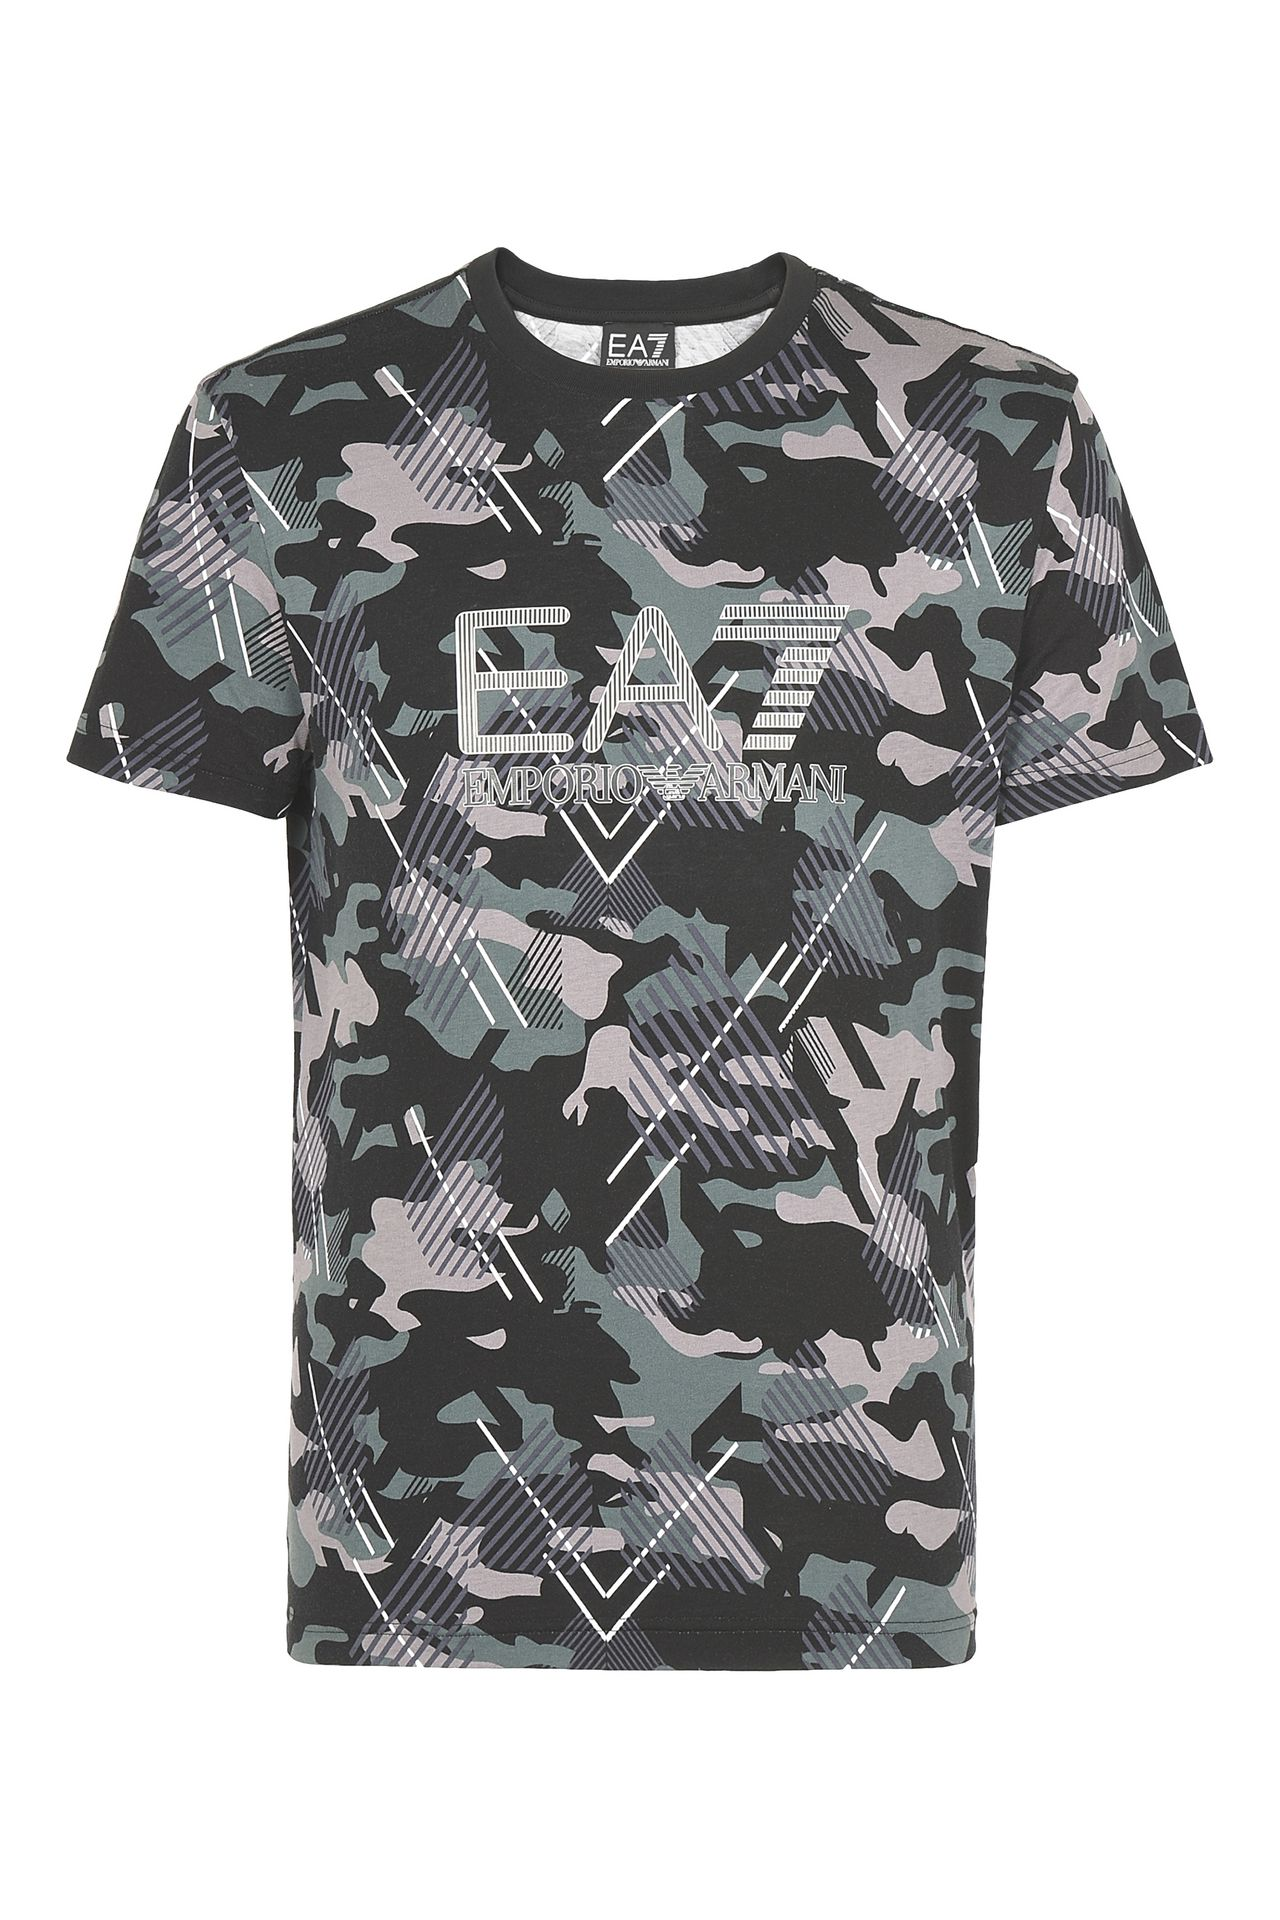 T-SHIRT IN COTONE : T-Shirt manica corta Uomo by Armani - 0